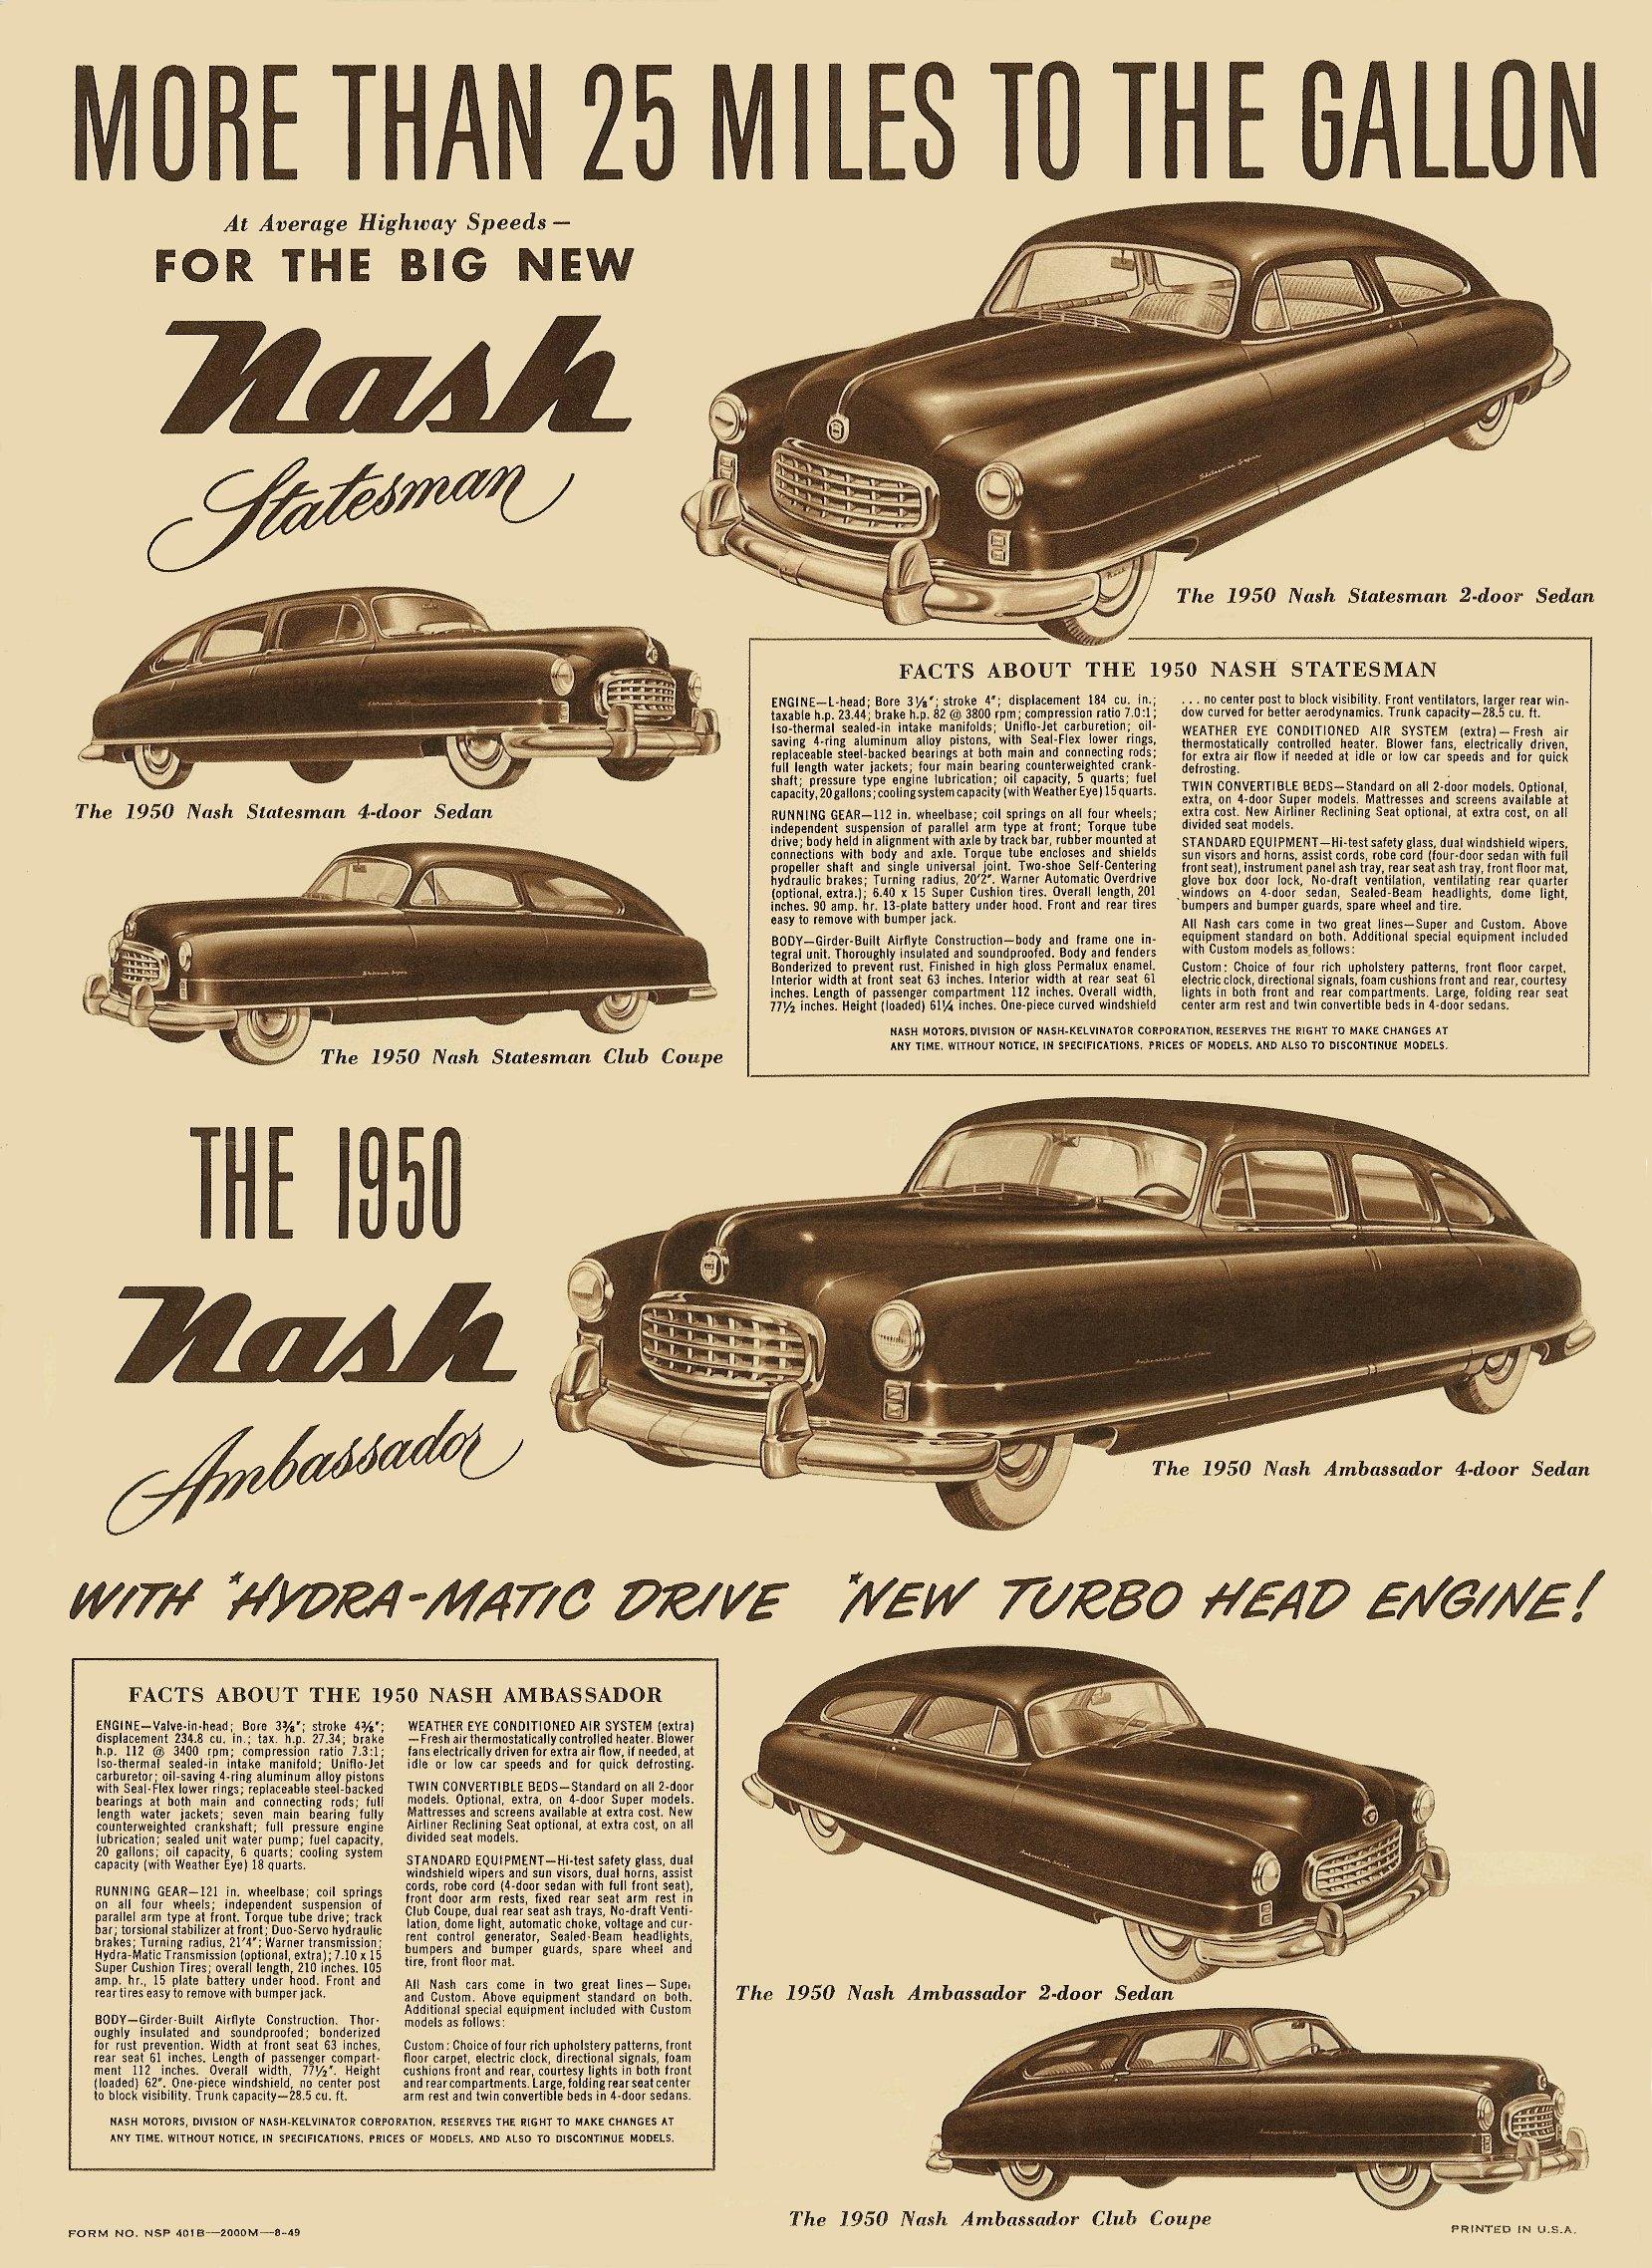 1950 NASH Airflyte Construction Sales Foldout 11″x14″ folded Form No. NSP 401B-2000M-8-49 Back page